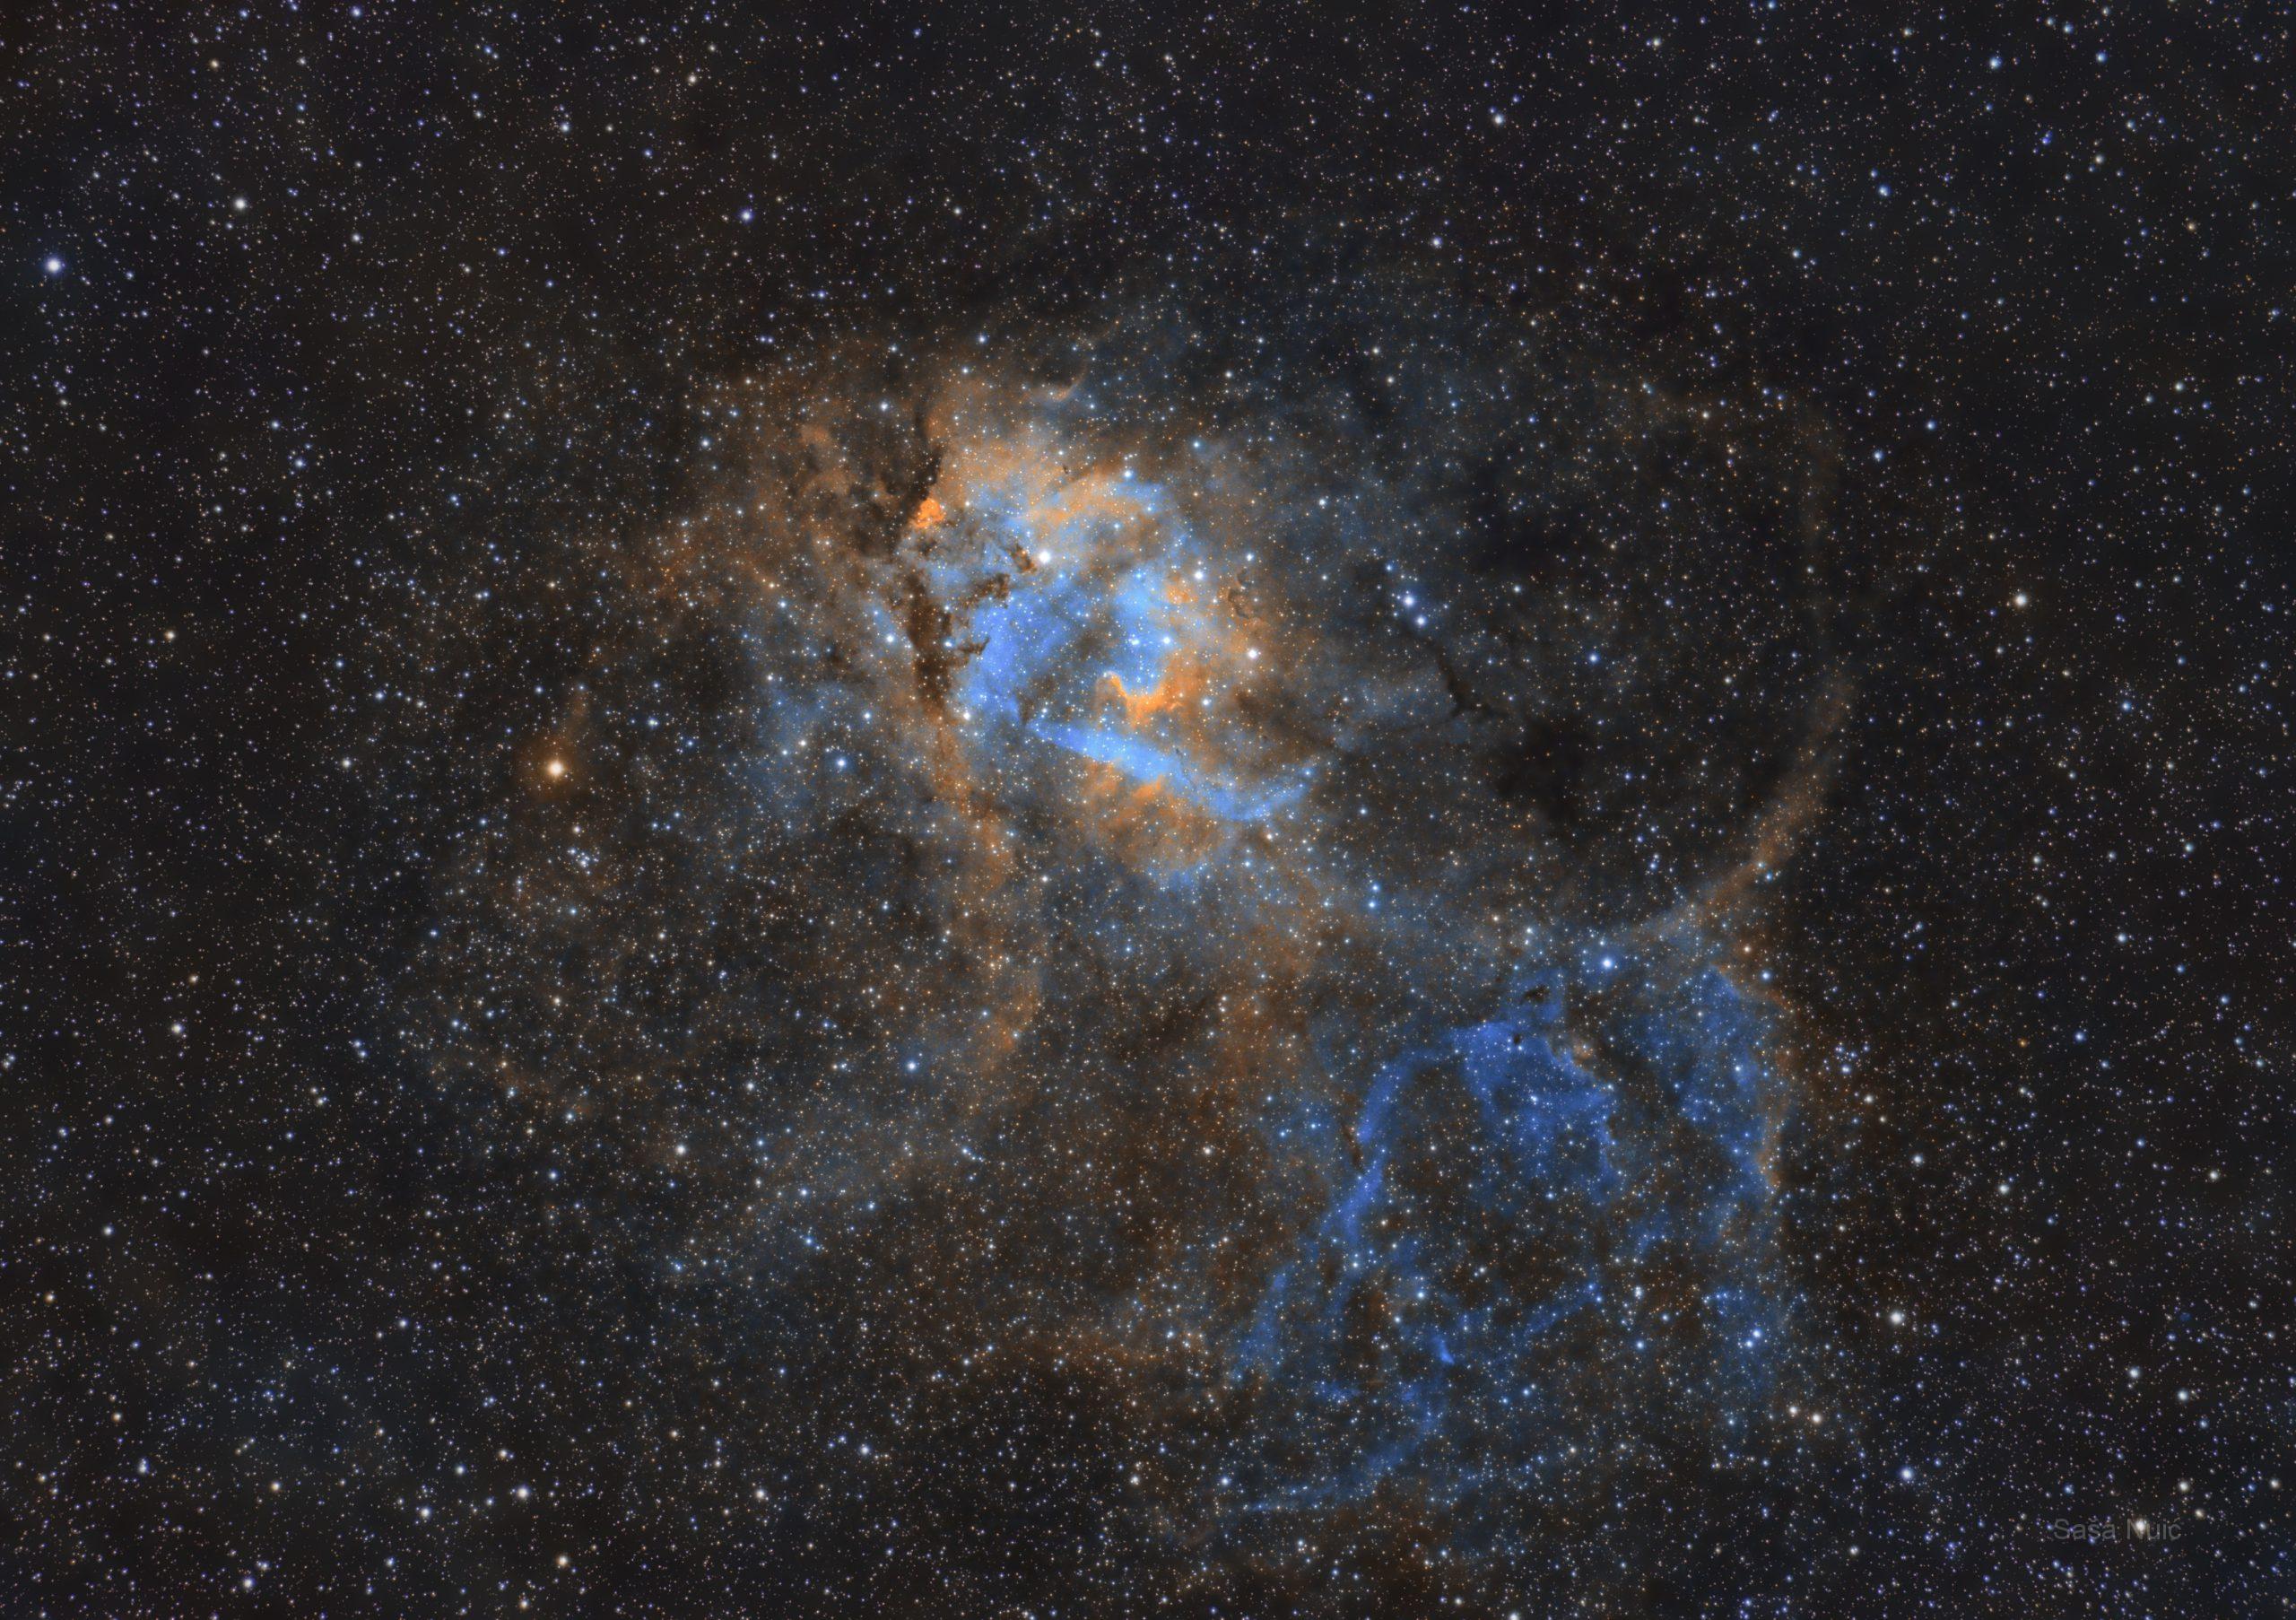 Hakuna Matata Carpe Diem (Sh2 132 – Maglica lav)